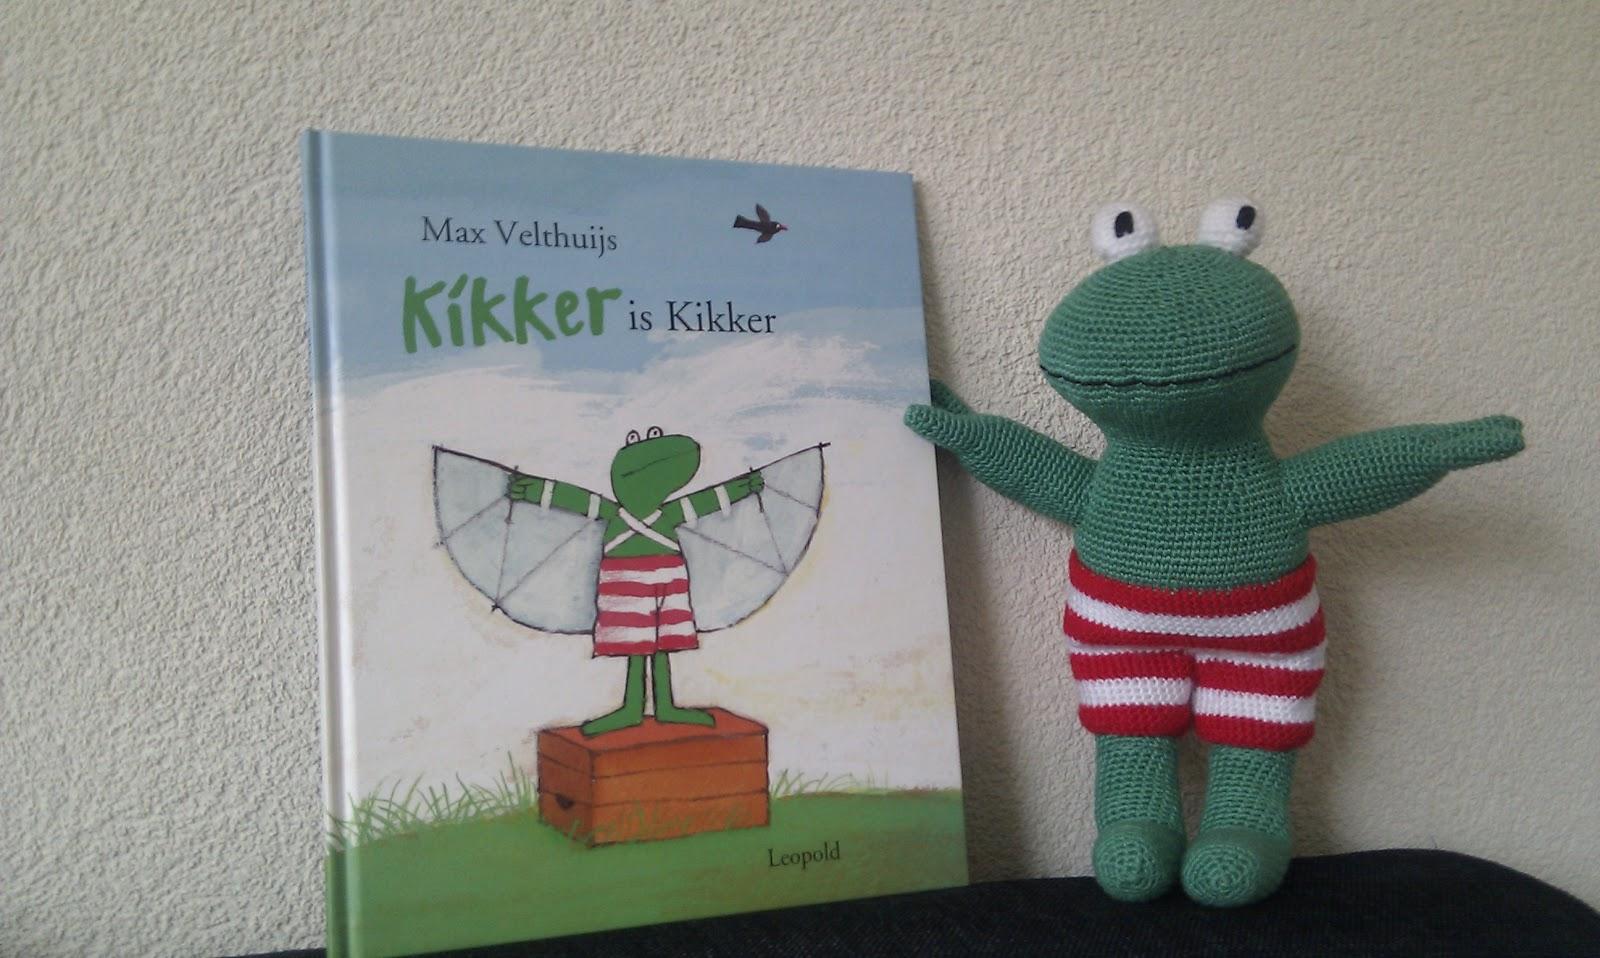 Sjorskreaties Kikker Gehaakt Max Velthuijs